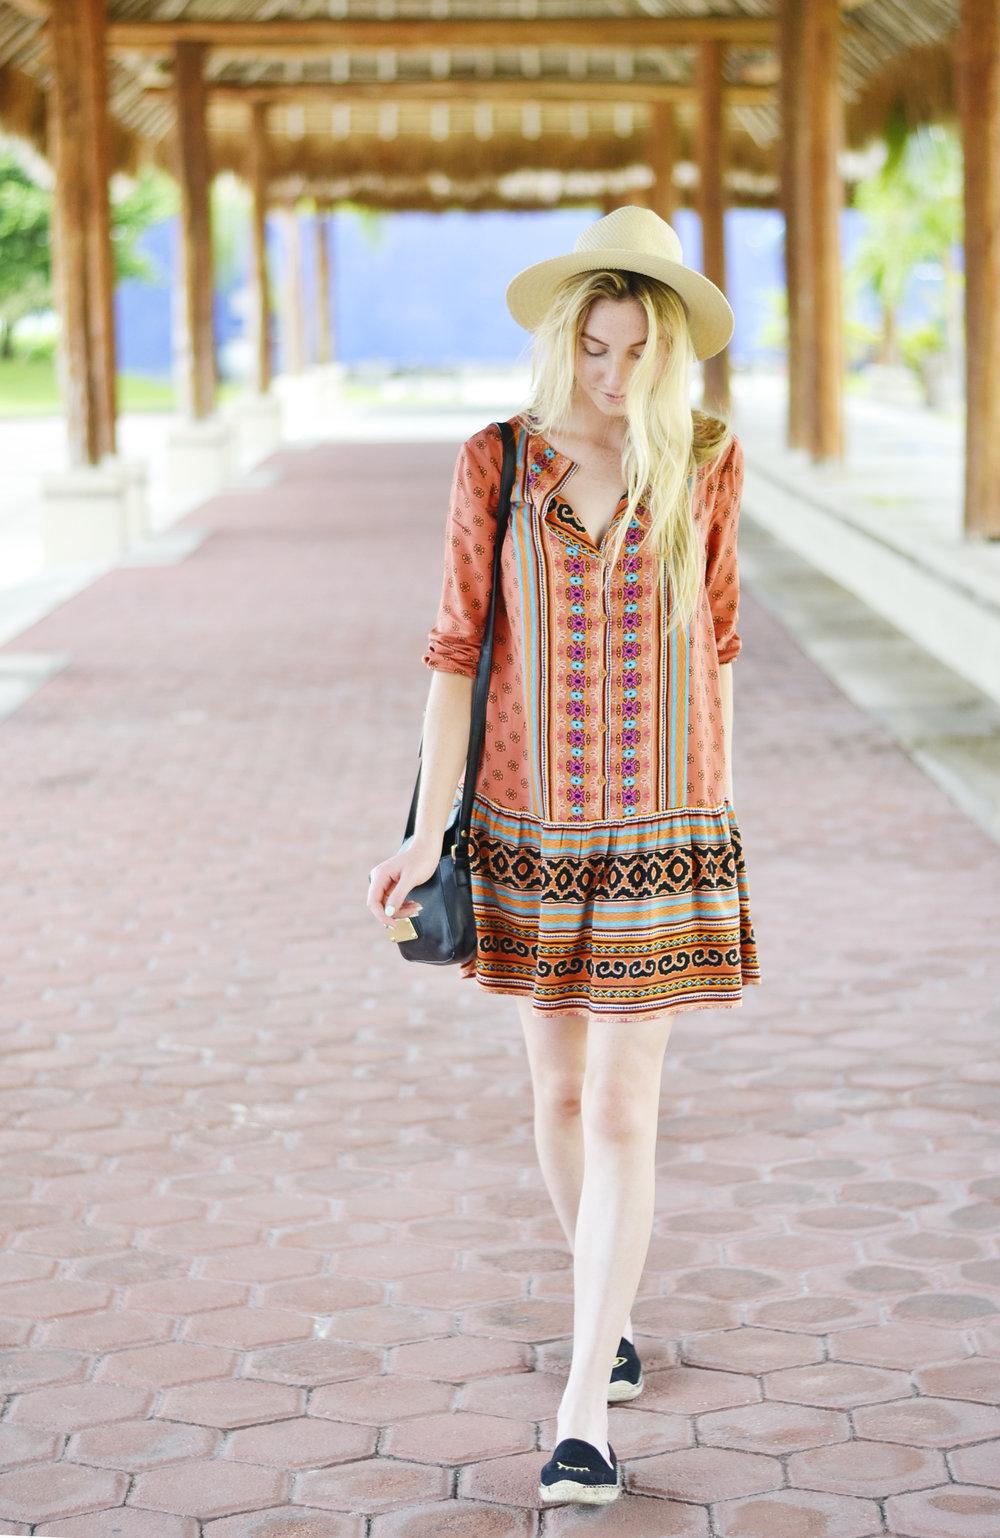 Blogger Drop Waist Dress (via Chic Now)